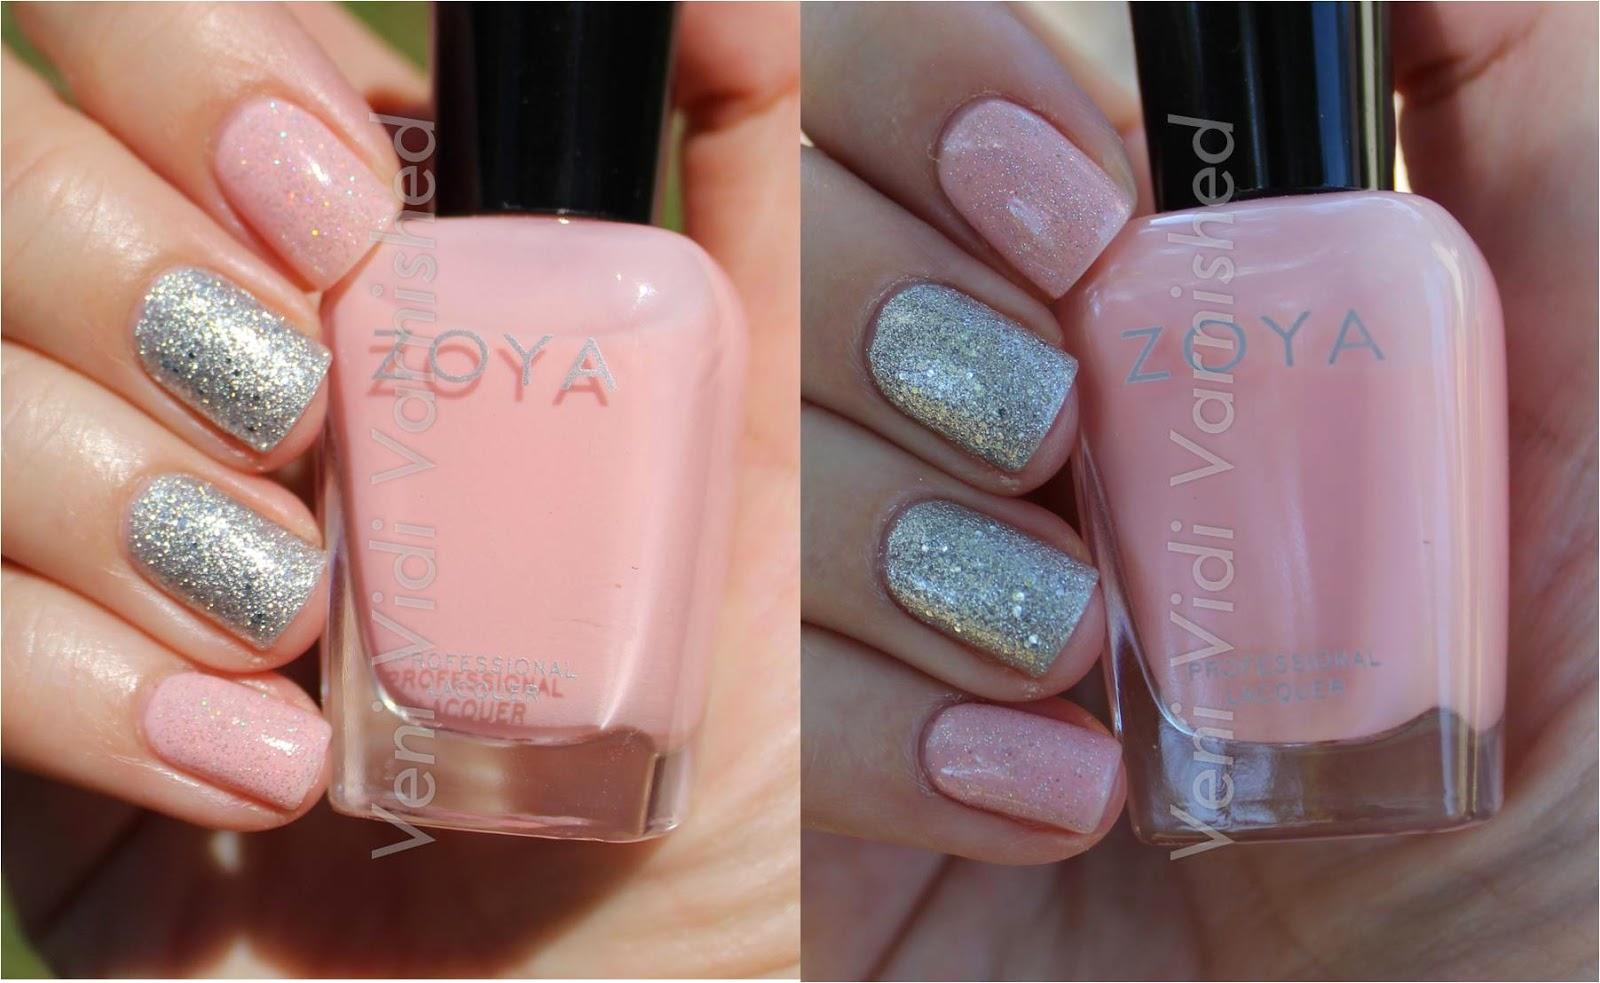 Zoya Dot Orly FX Silver Pixel China Glaze Fairy Dust Nail Polish NOTD